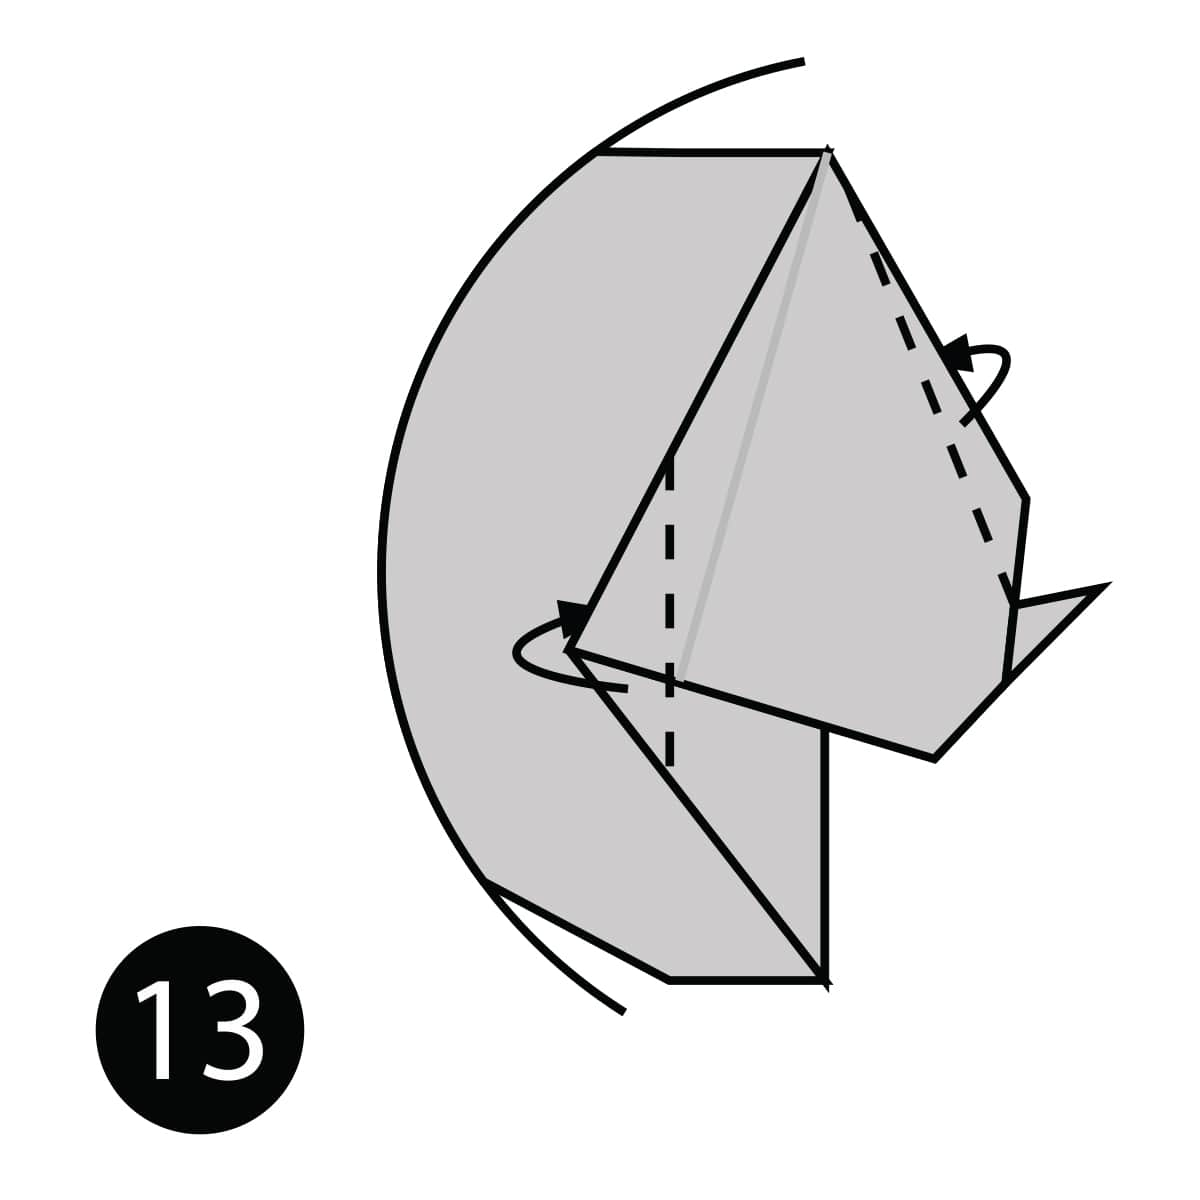 Rhino Step 13